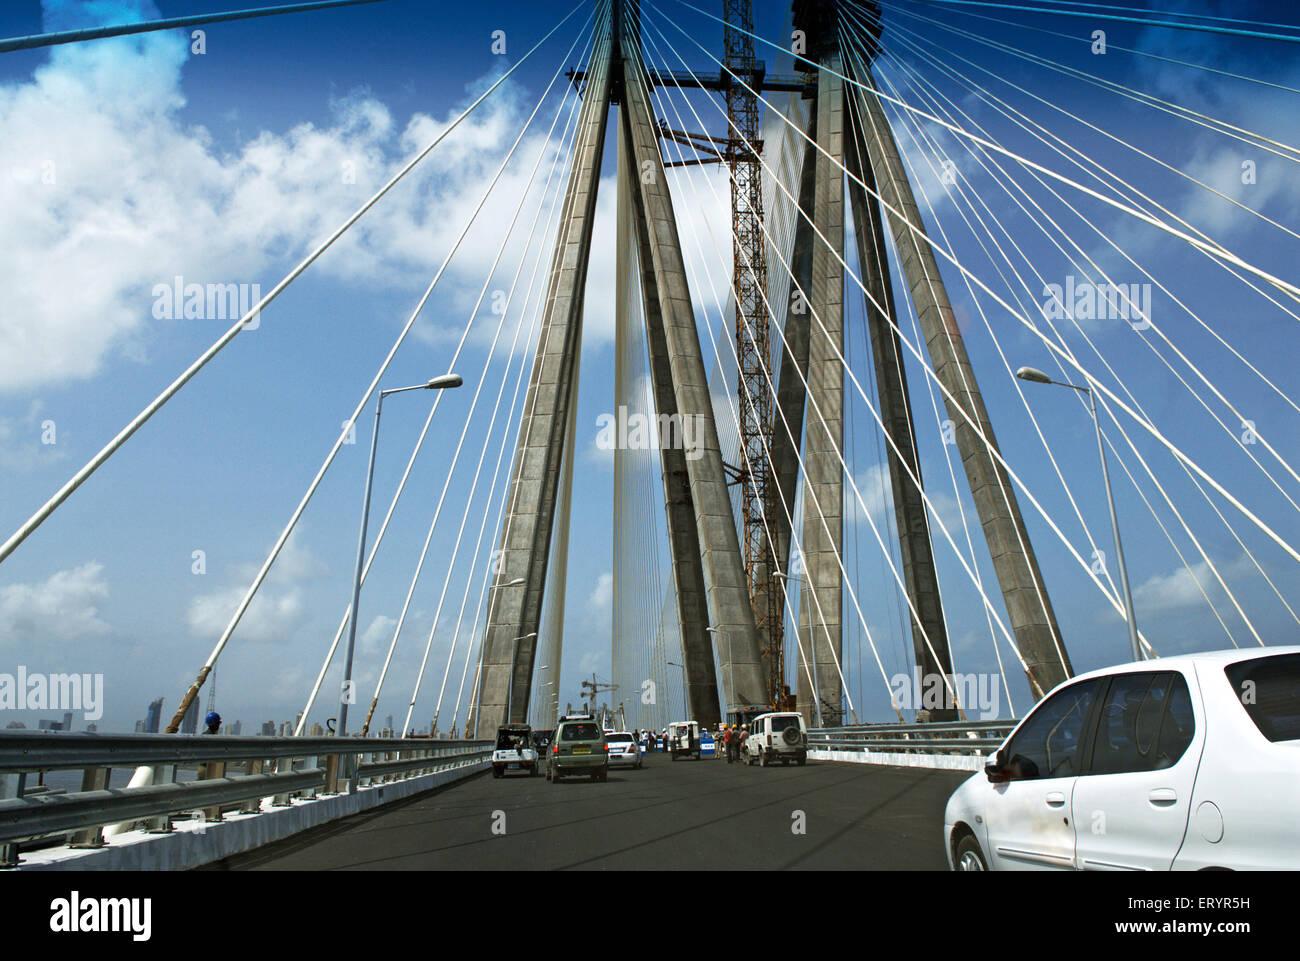 Twin carriageway of bandra worli known rajiv gandhi sea link ; Bombay Mumbai ; Maharashtra ; India 13 June 2009 - Stock Image